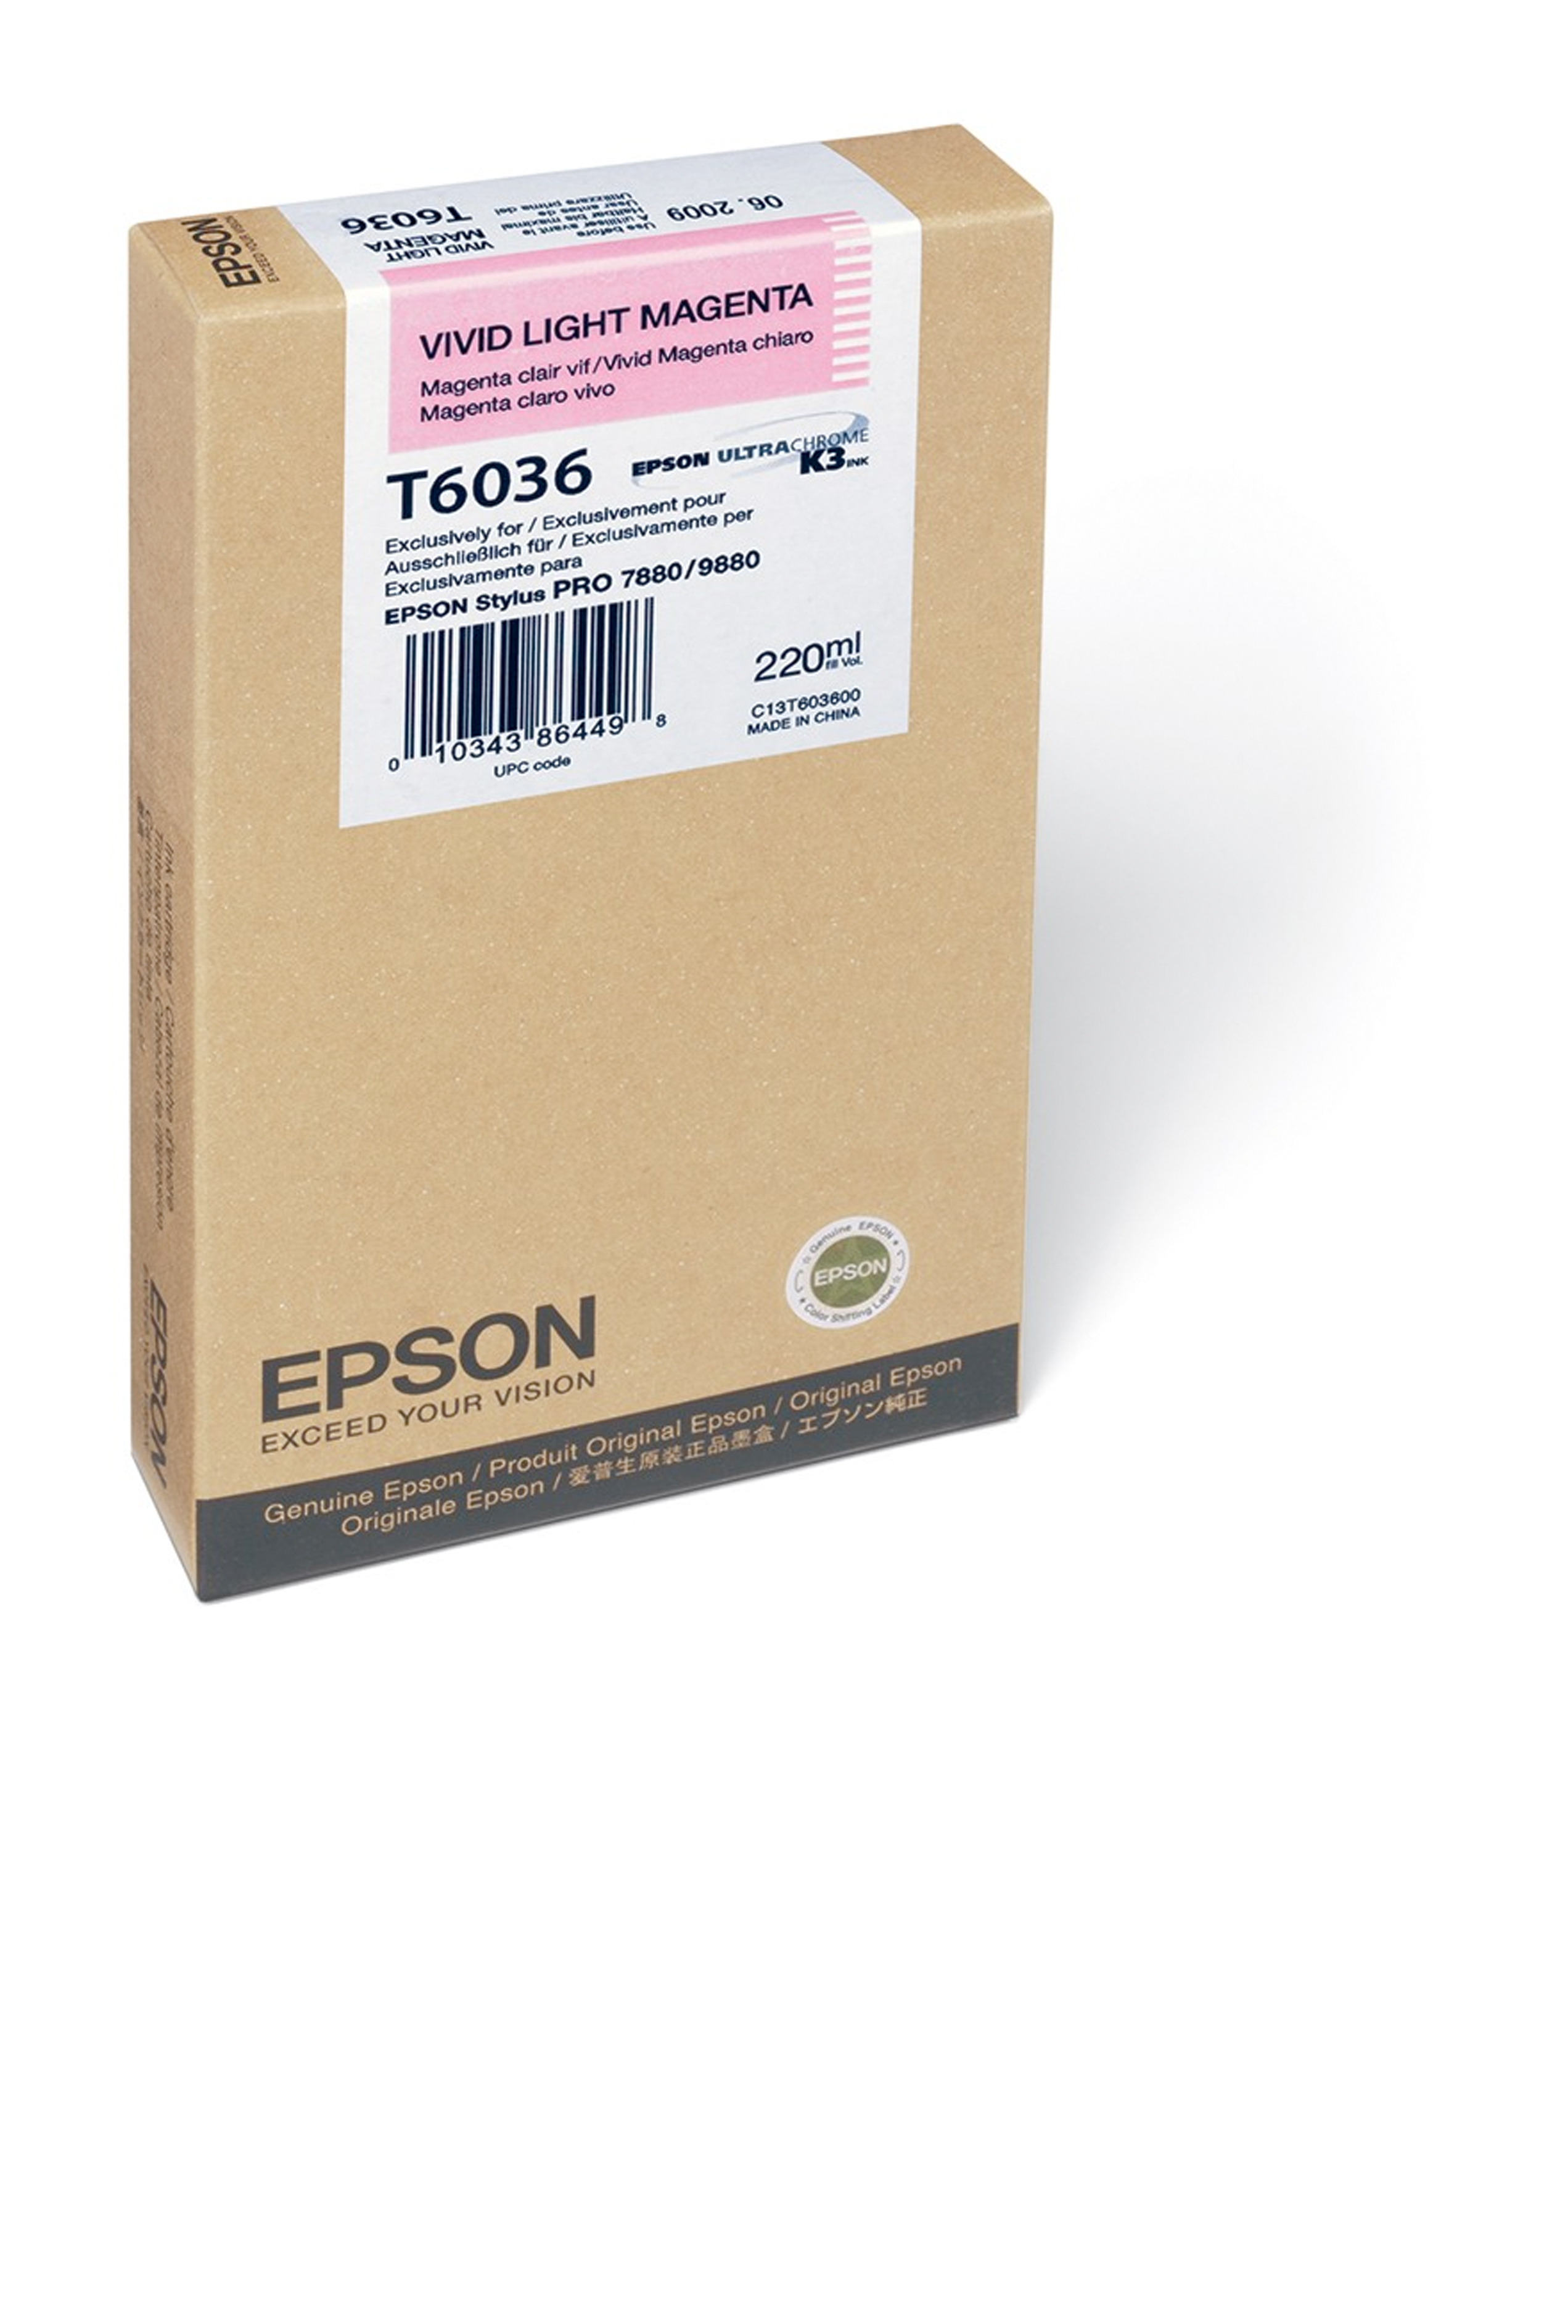 Epson EPSON SD VIVID LT MAGENTA (220 ML) (T603600)